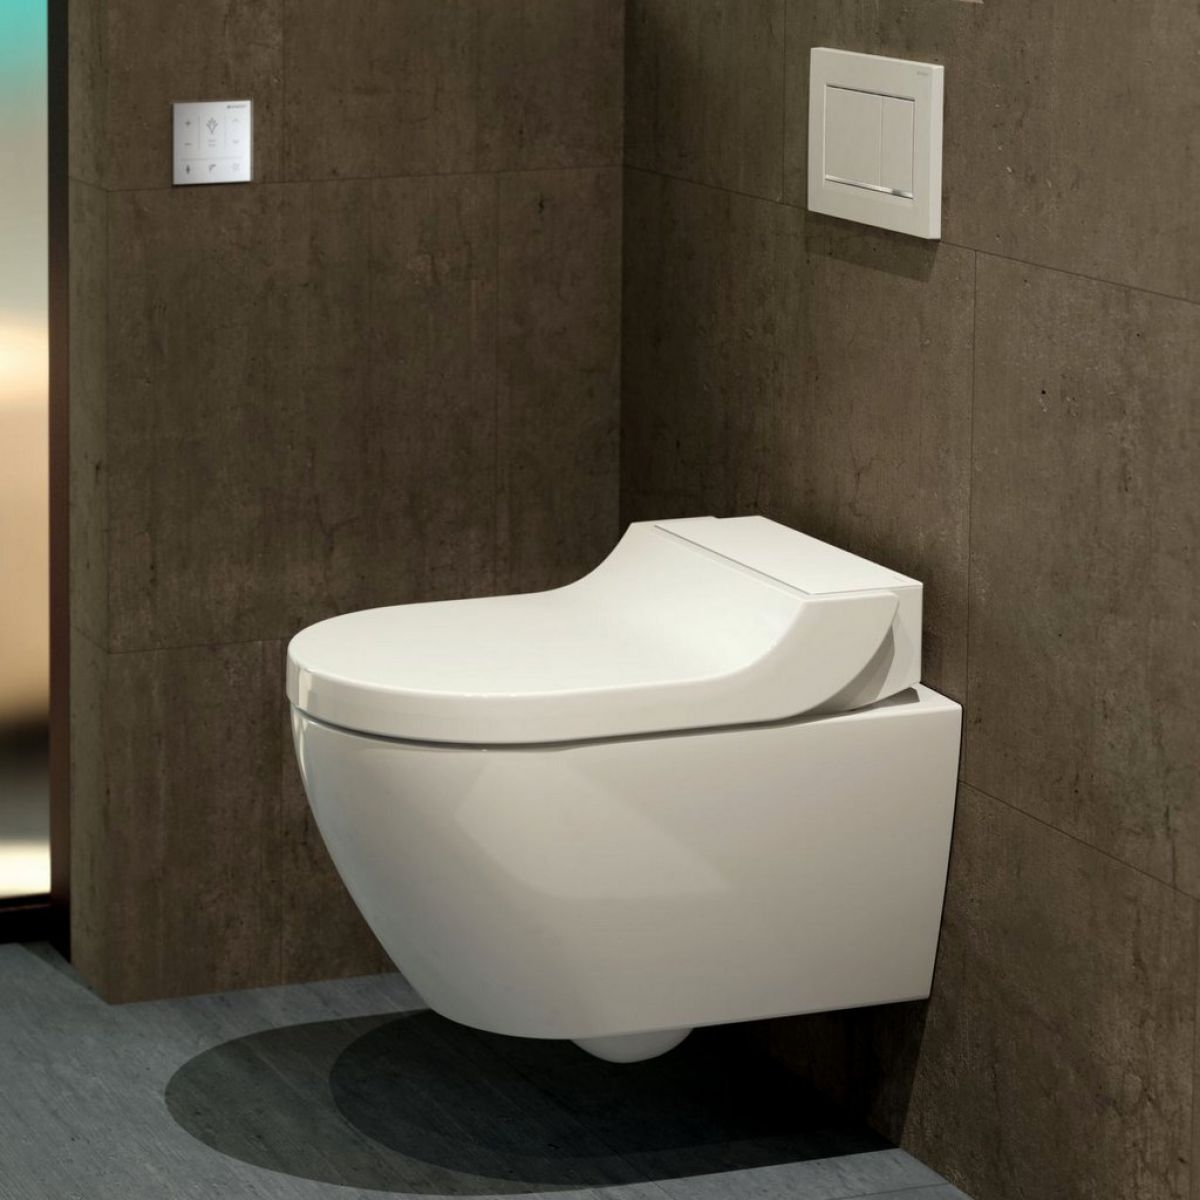 geberit aquaclean tuma rimless wall hung shower toilet uk bathrooms. Black Bedroom Furniture Sets. Home Design Ideas